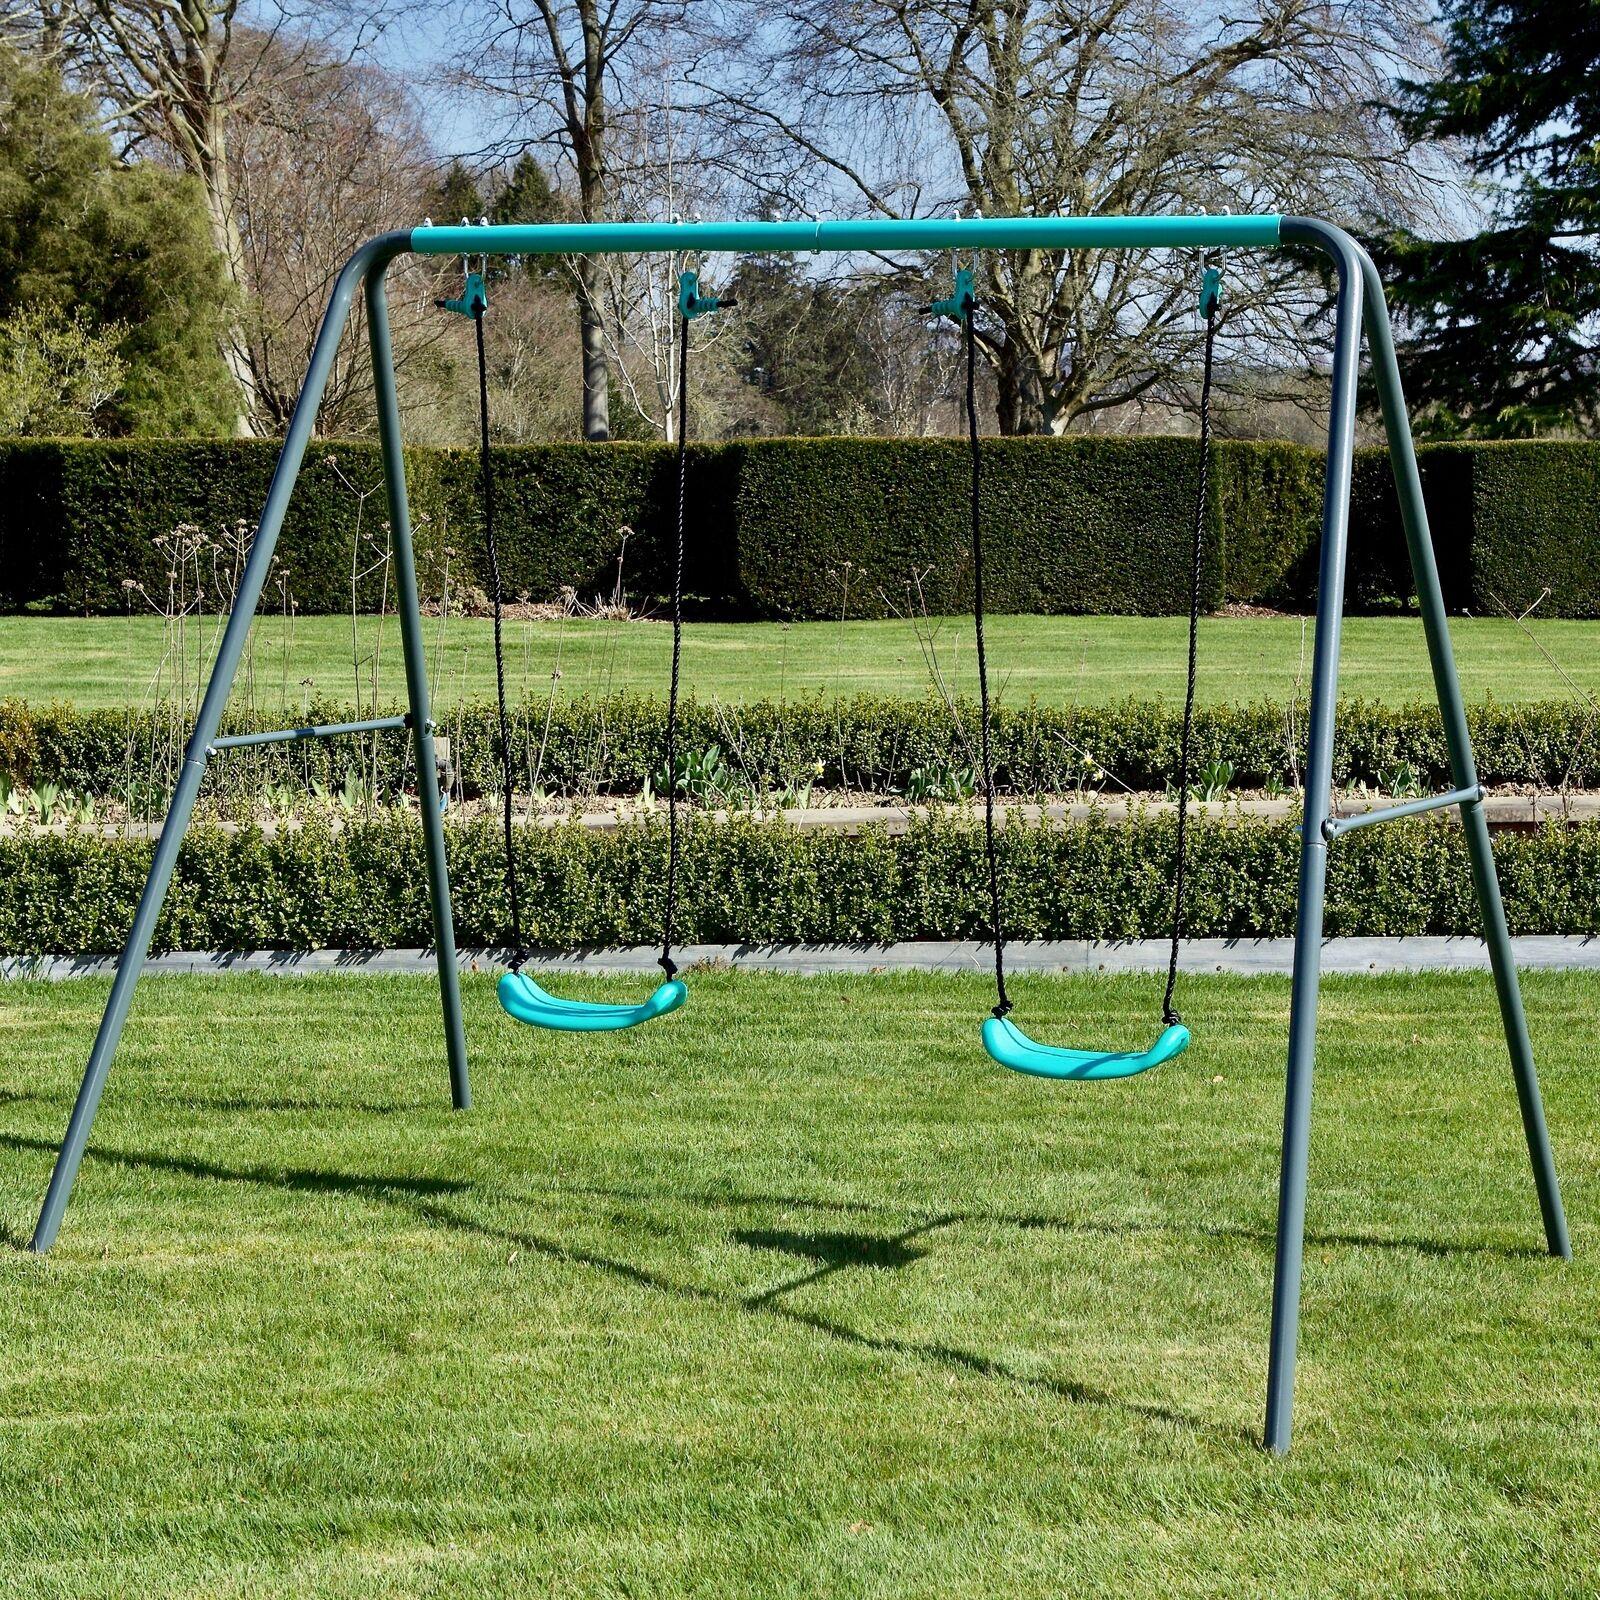 Rebo Children's Metal Garden Swing Set – Double Swing now £71.96 delivered using code @ eBay / outdoortoy